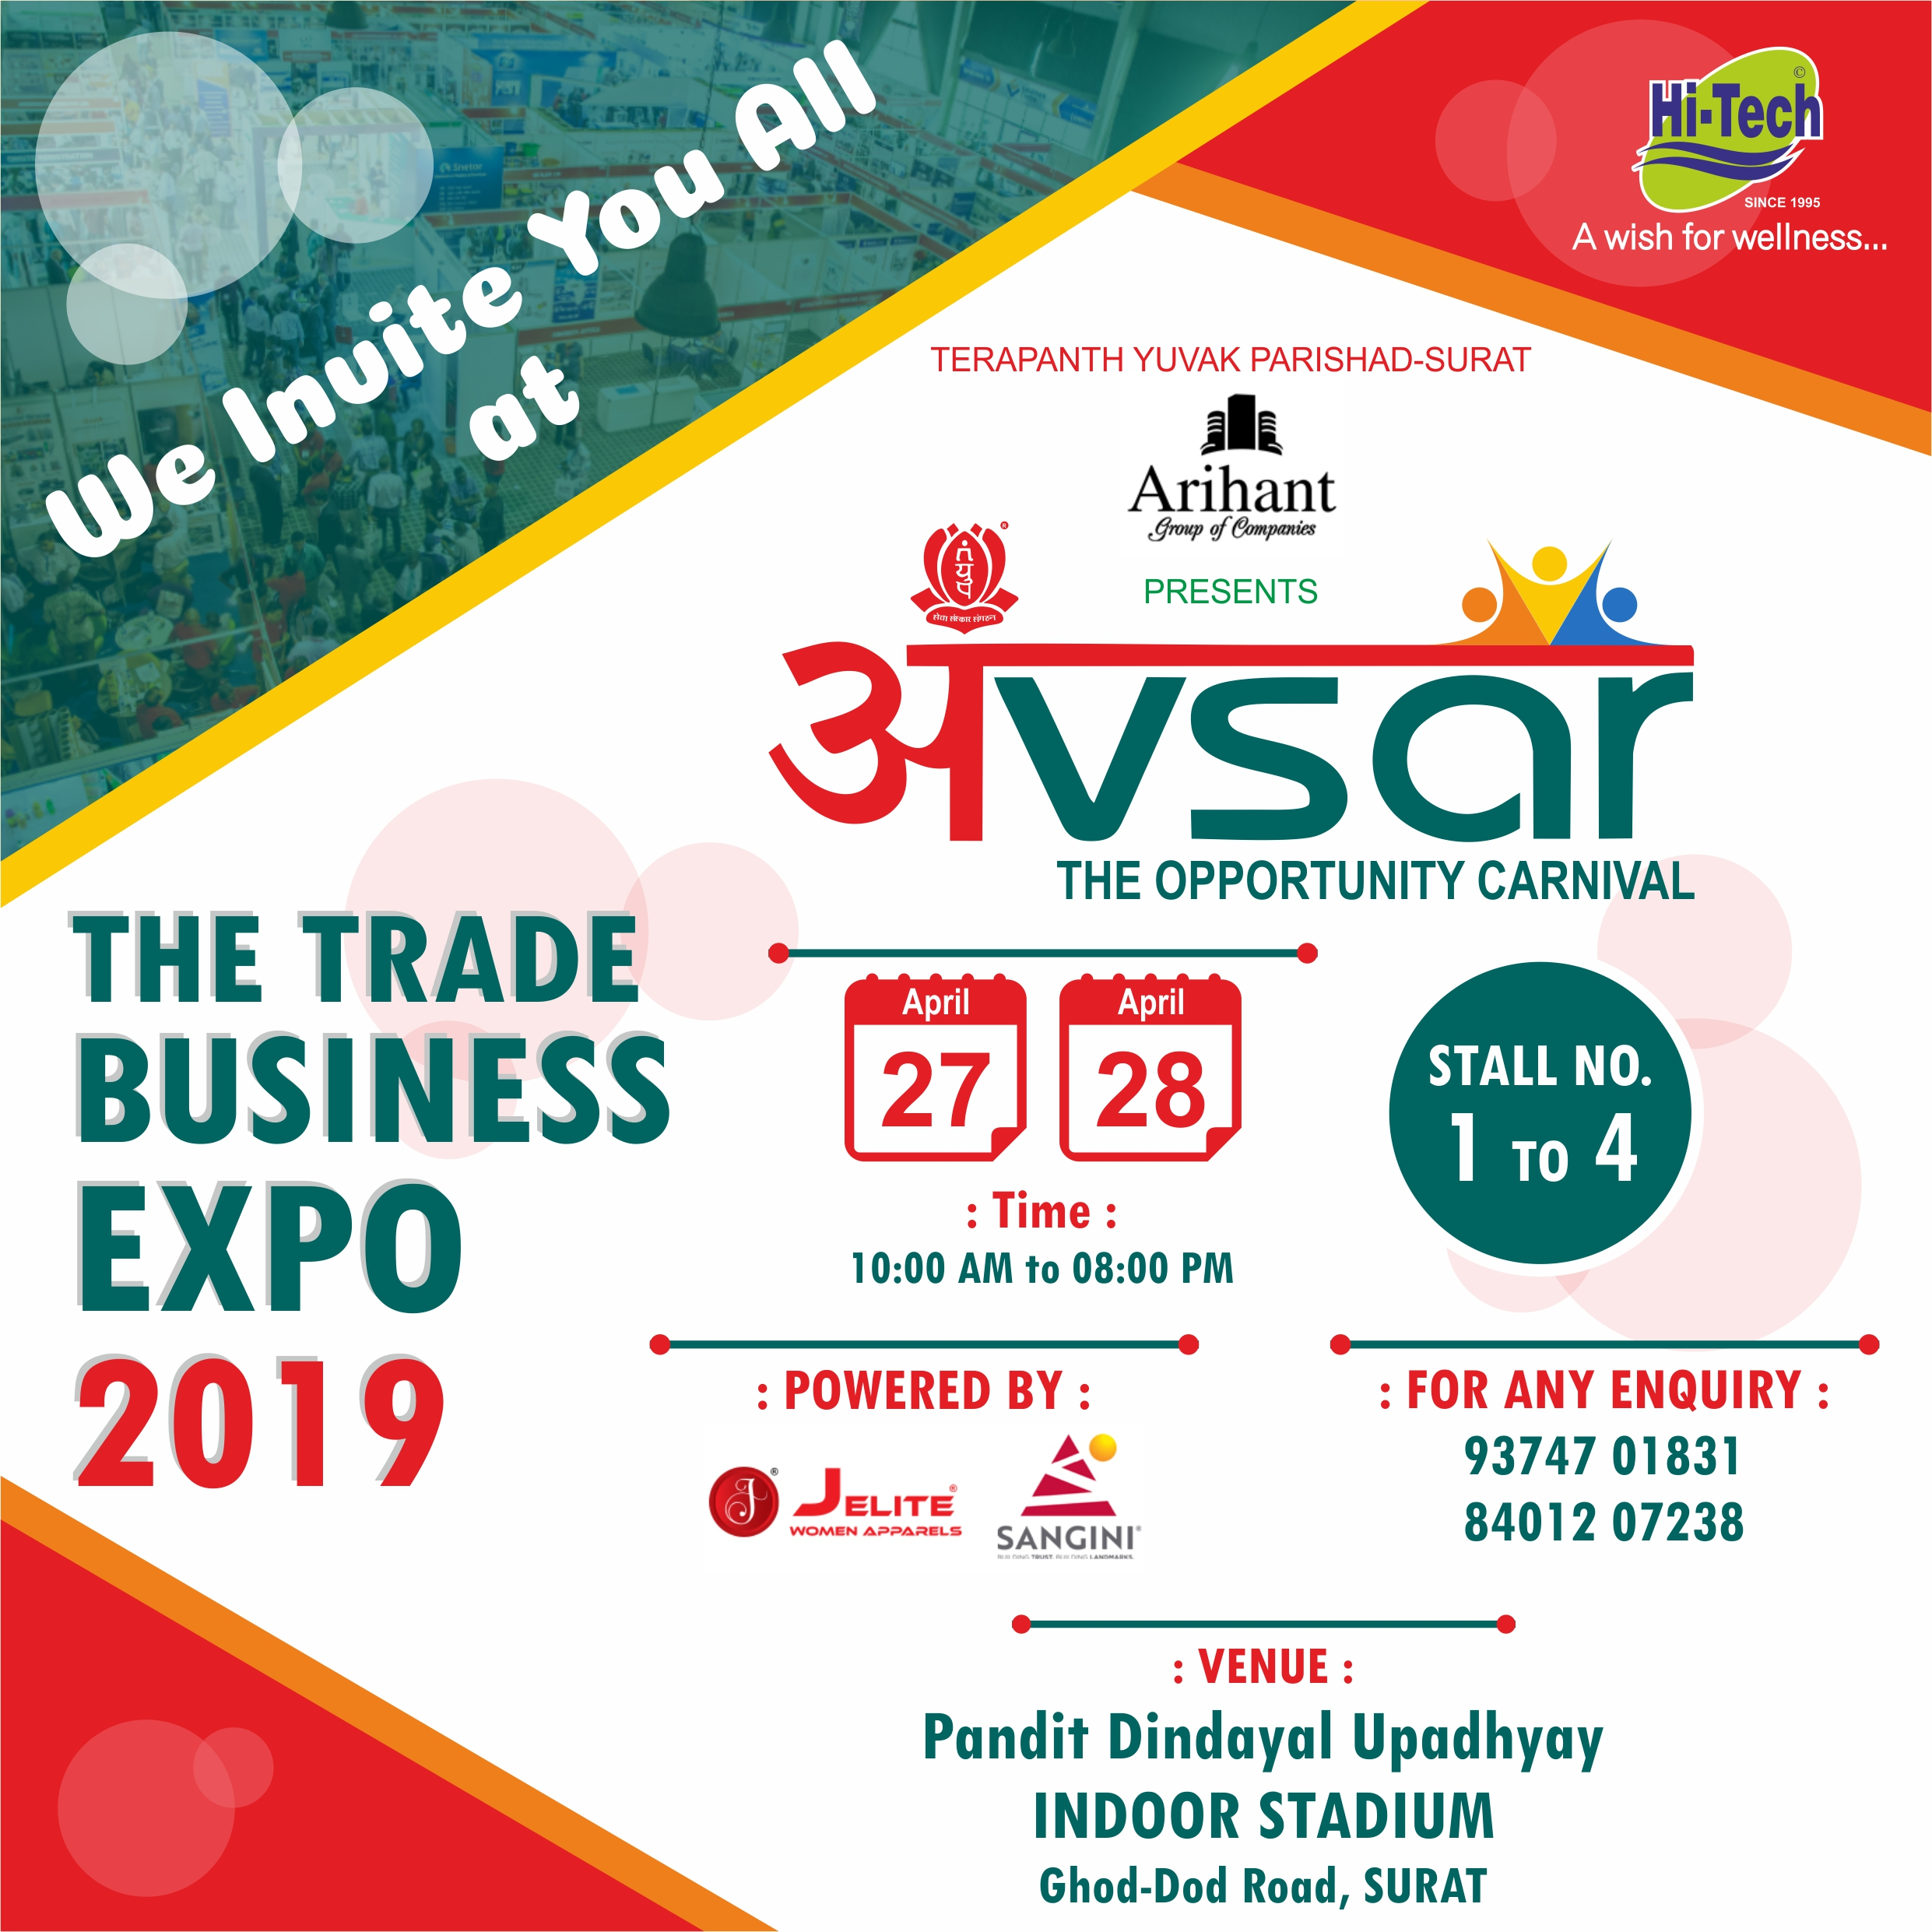 The Trade Business EXPO Avsar